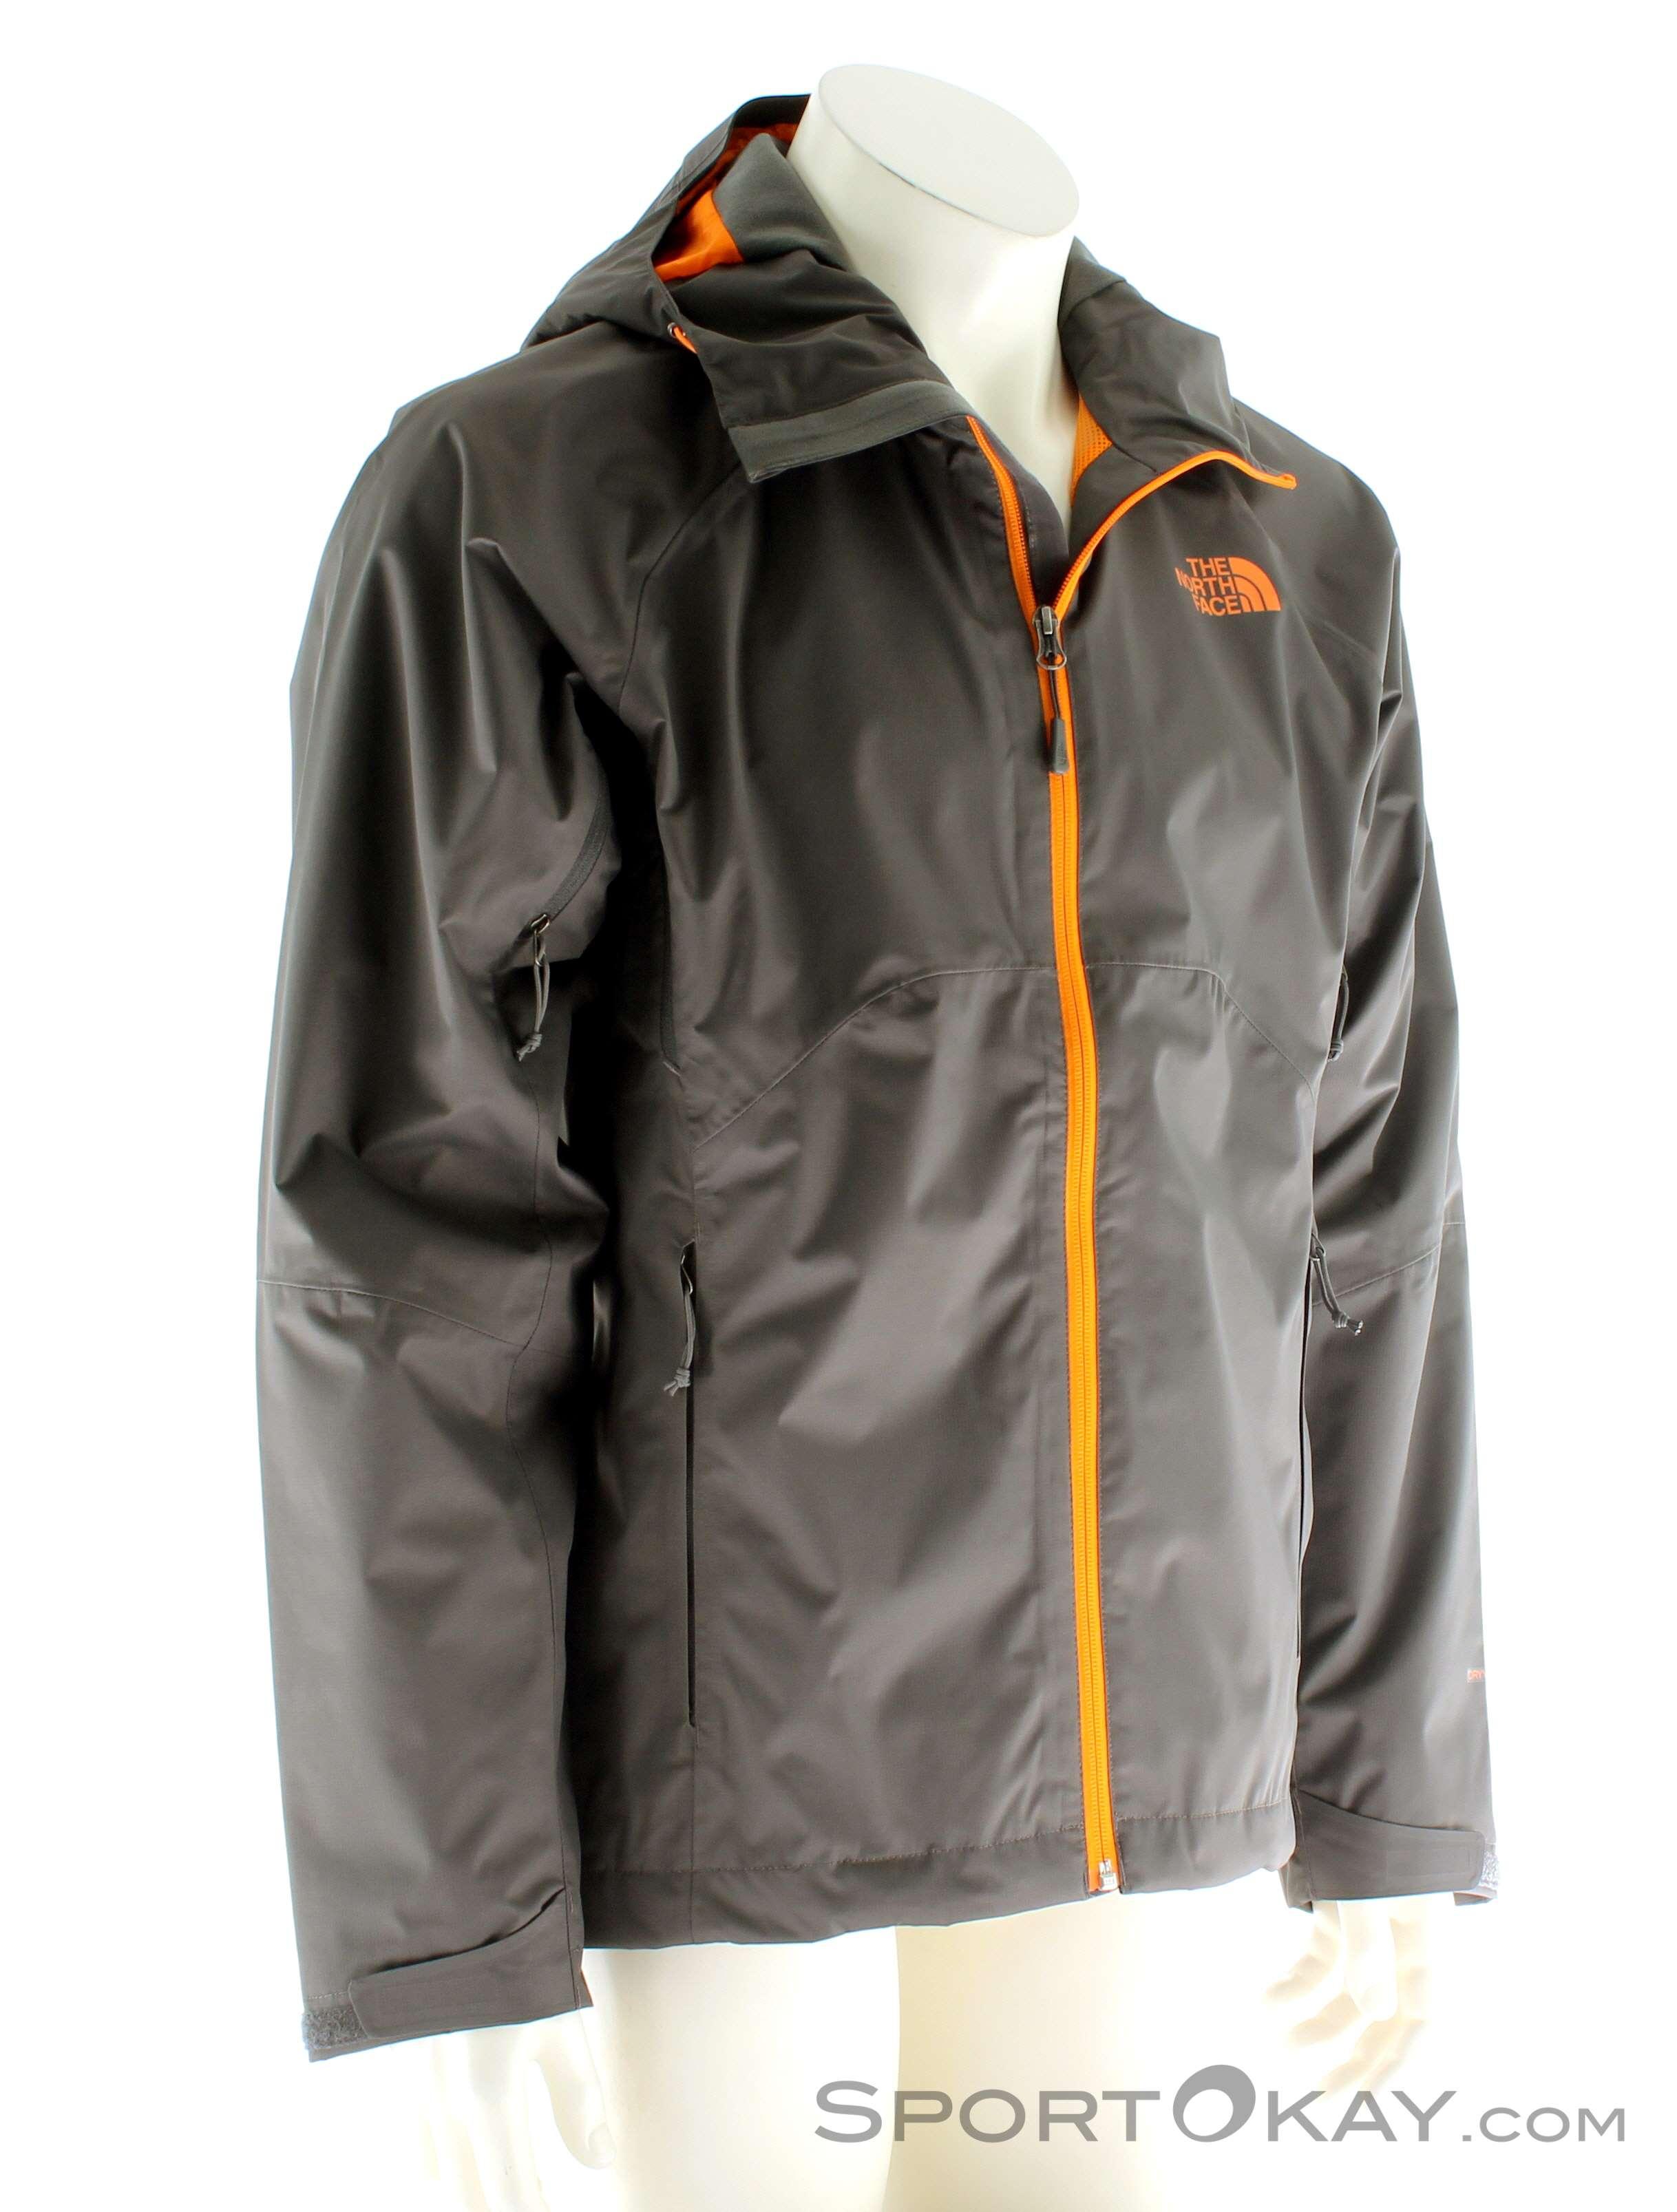 sale retailer e211c eaf95 promo code for the north face highland jacket damen 93967 99f28